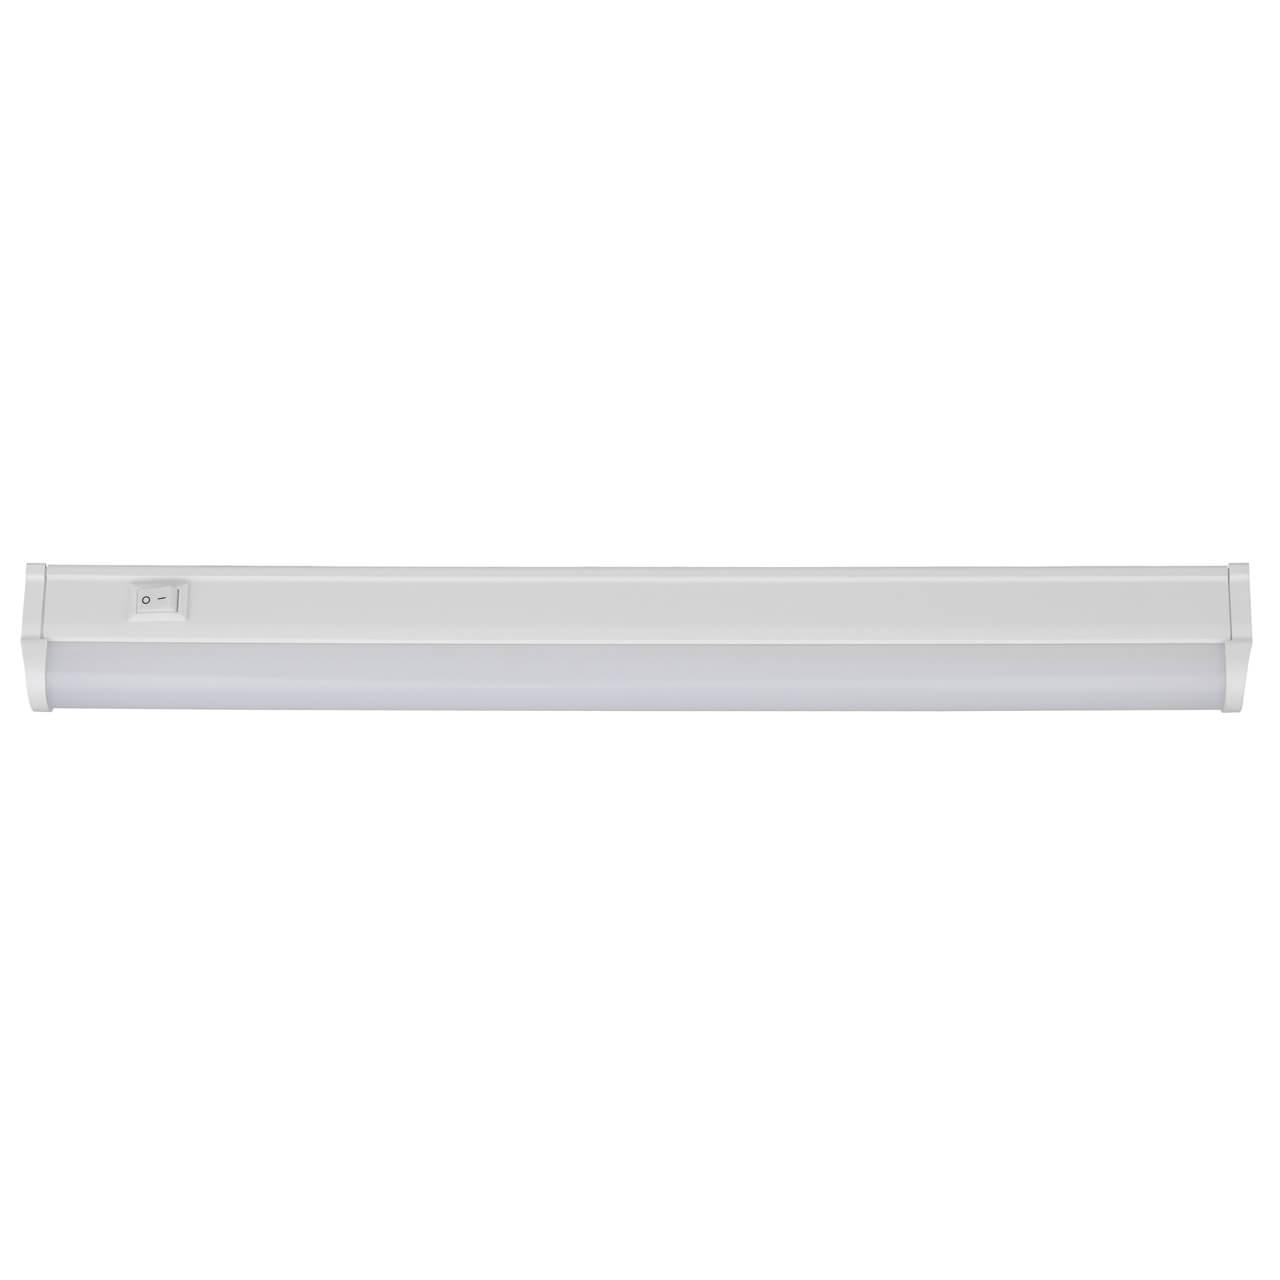 цена на Настенно-потолочный светильник ЭРА LLED-01-04W-4000-W